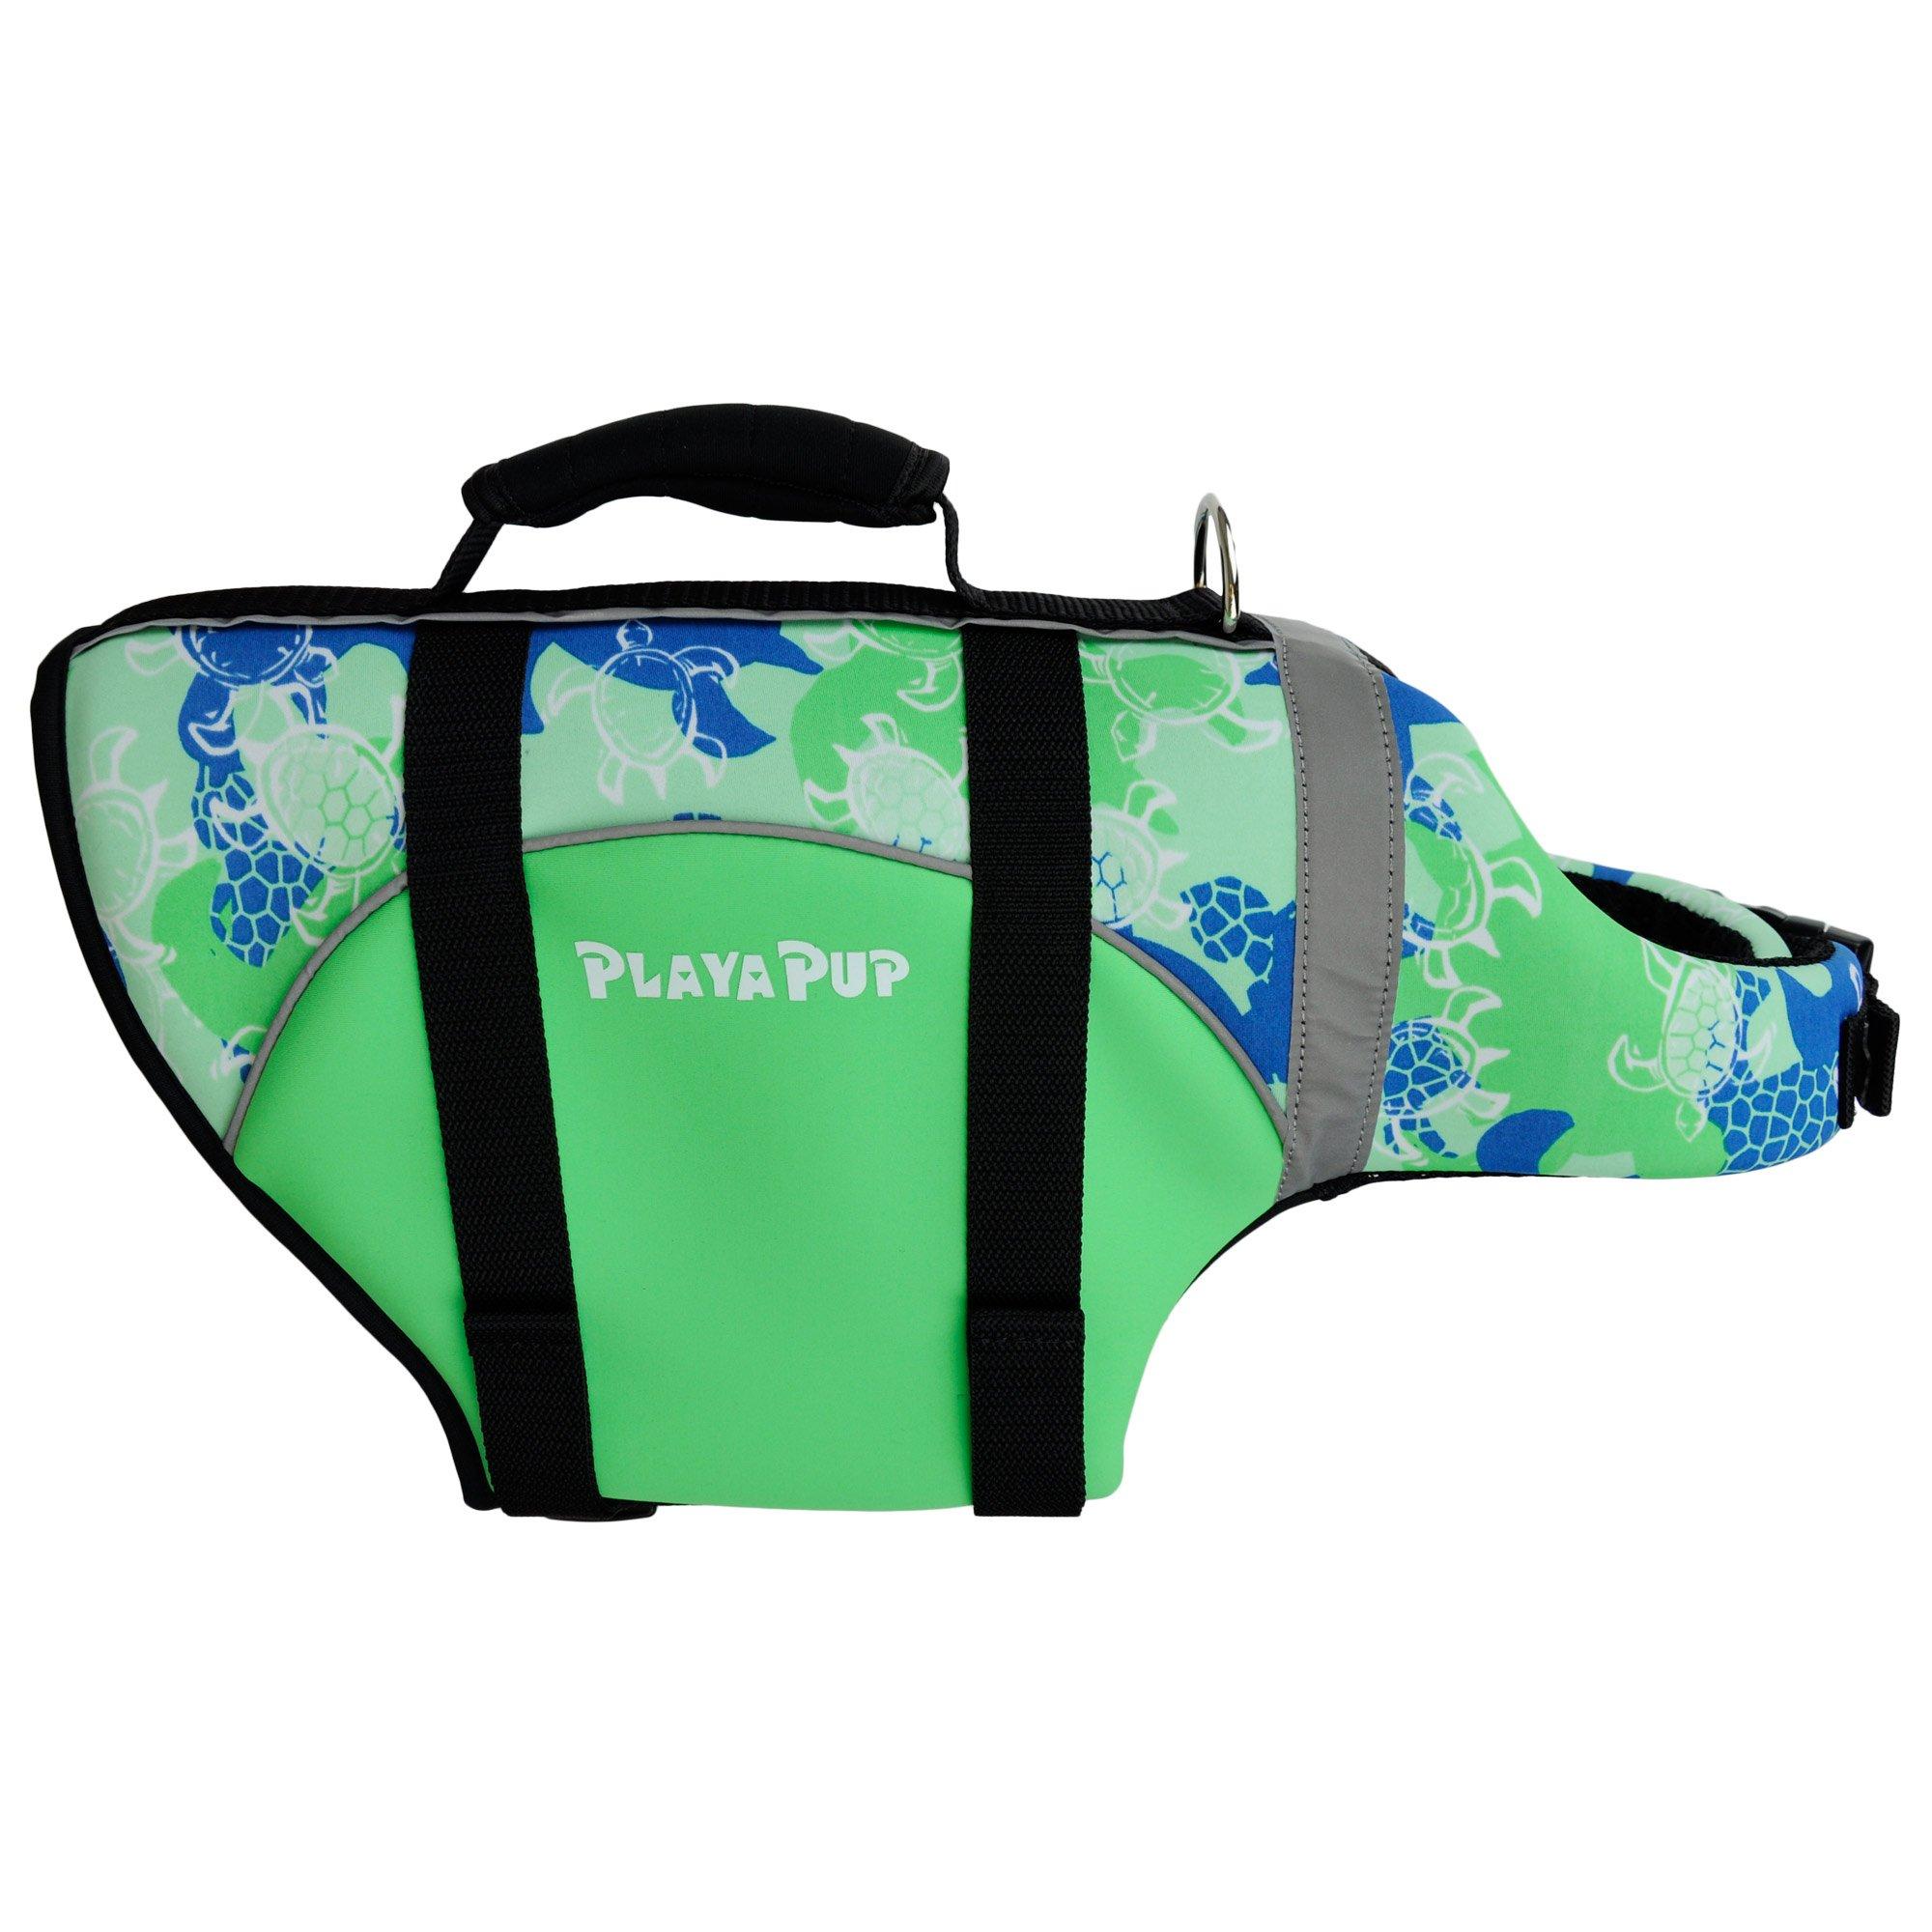 Image of Playa Pup Green Dog Flotation Vest, Medium